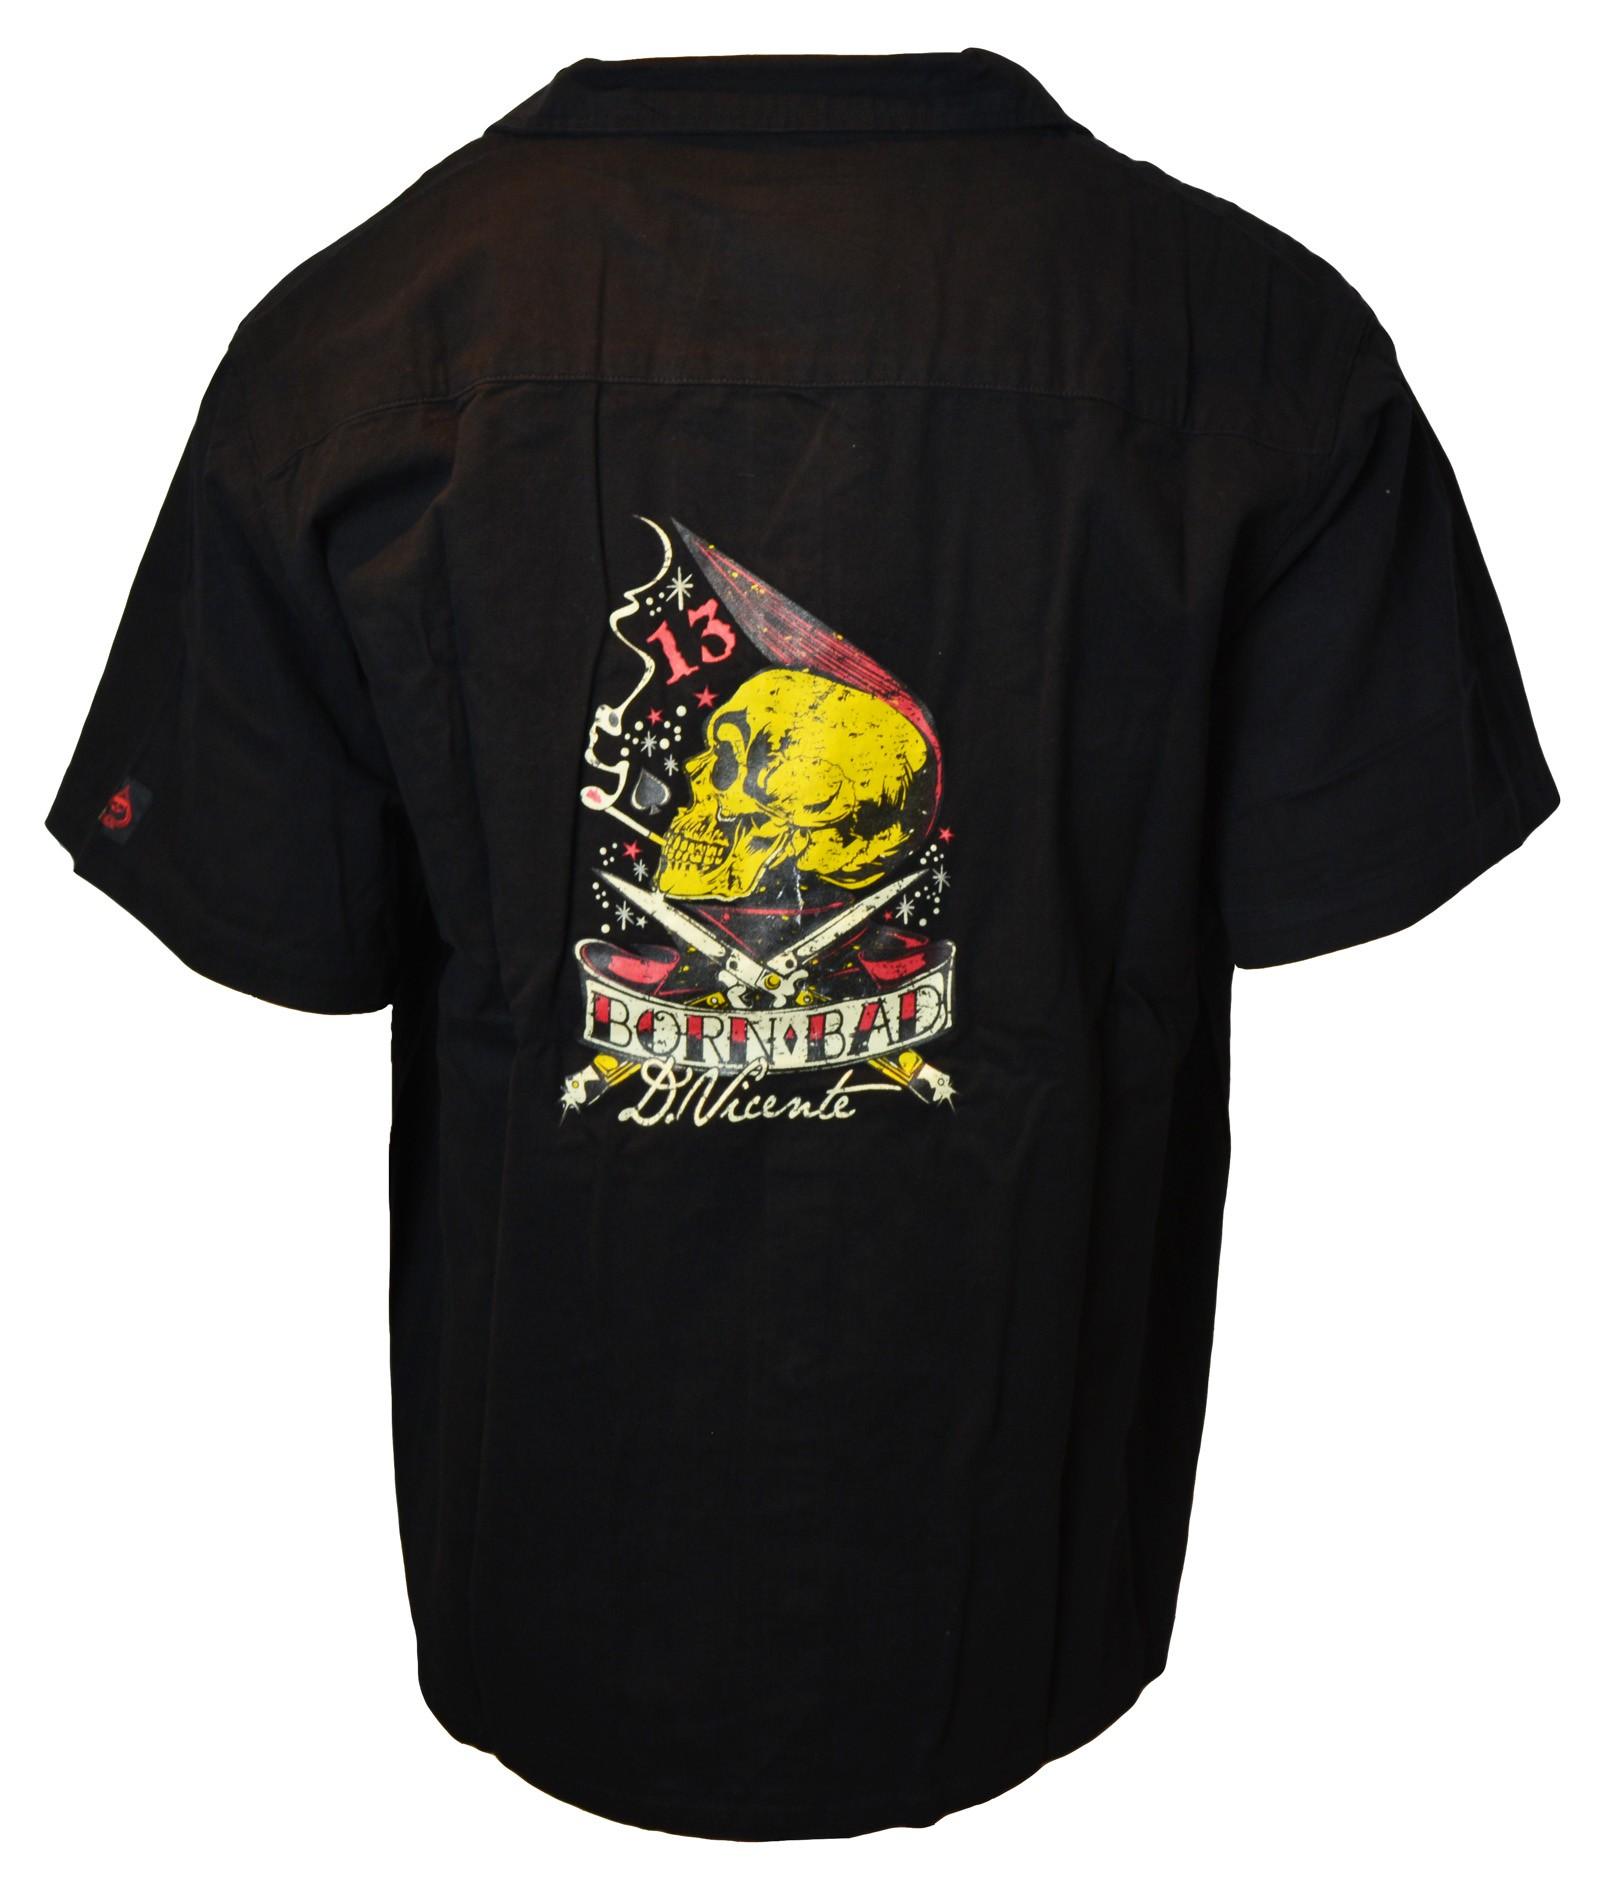 David Vicente - Born Bad Work Shirt